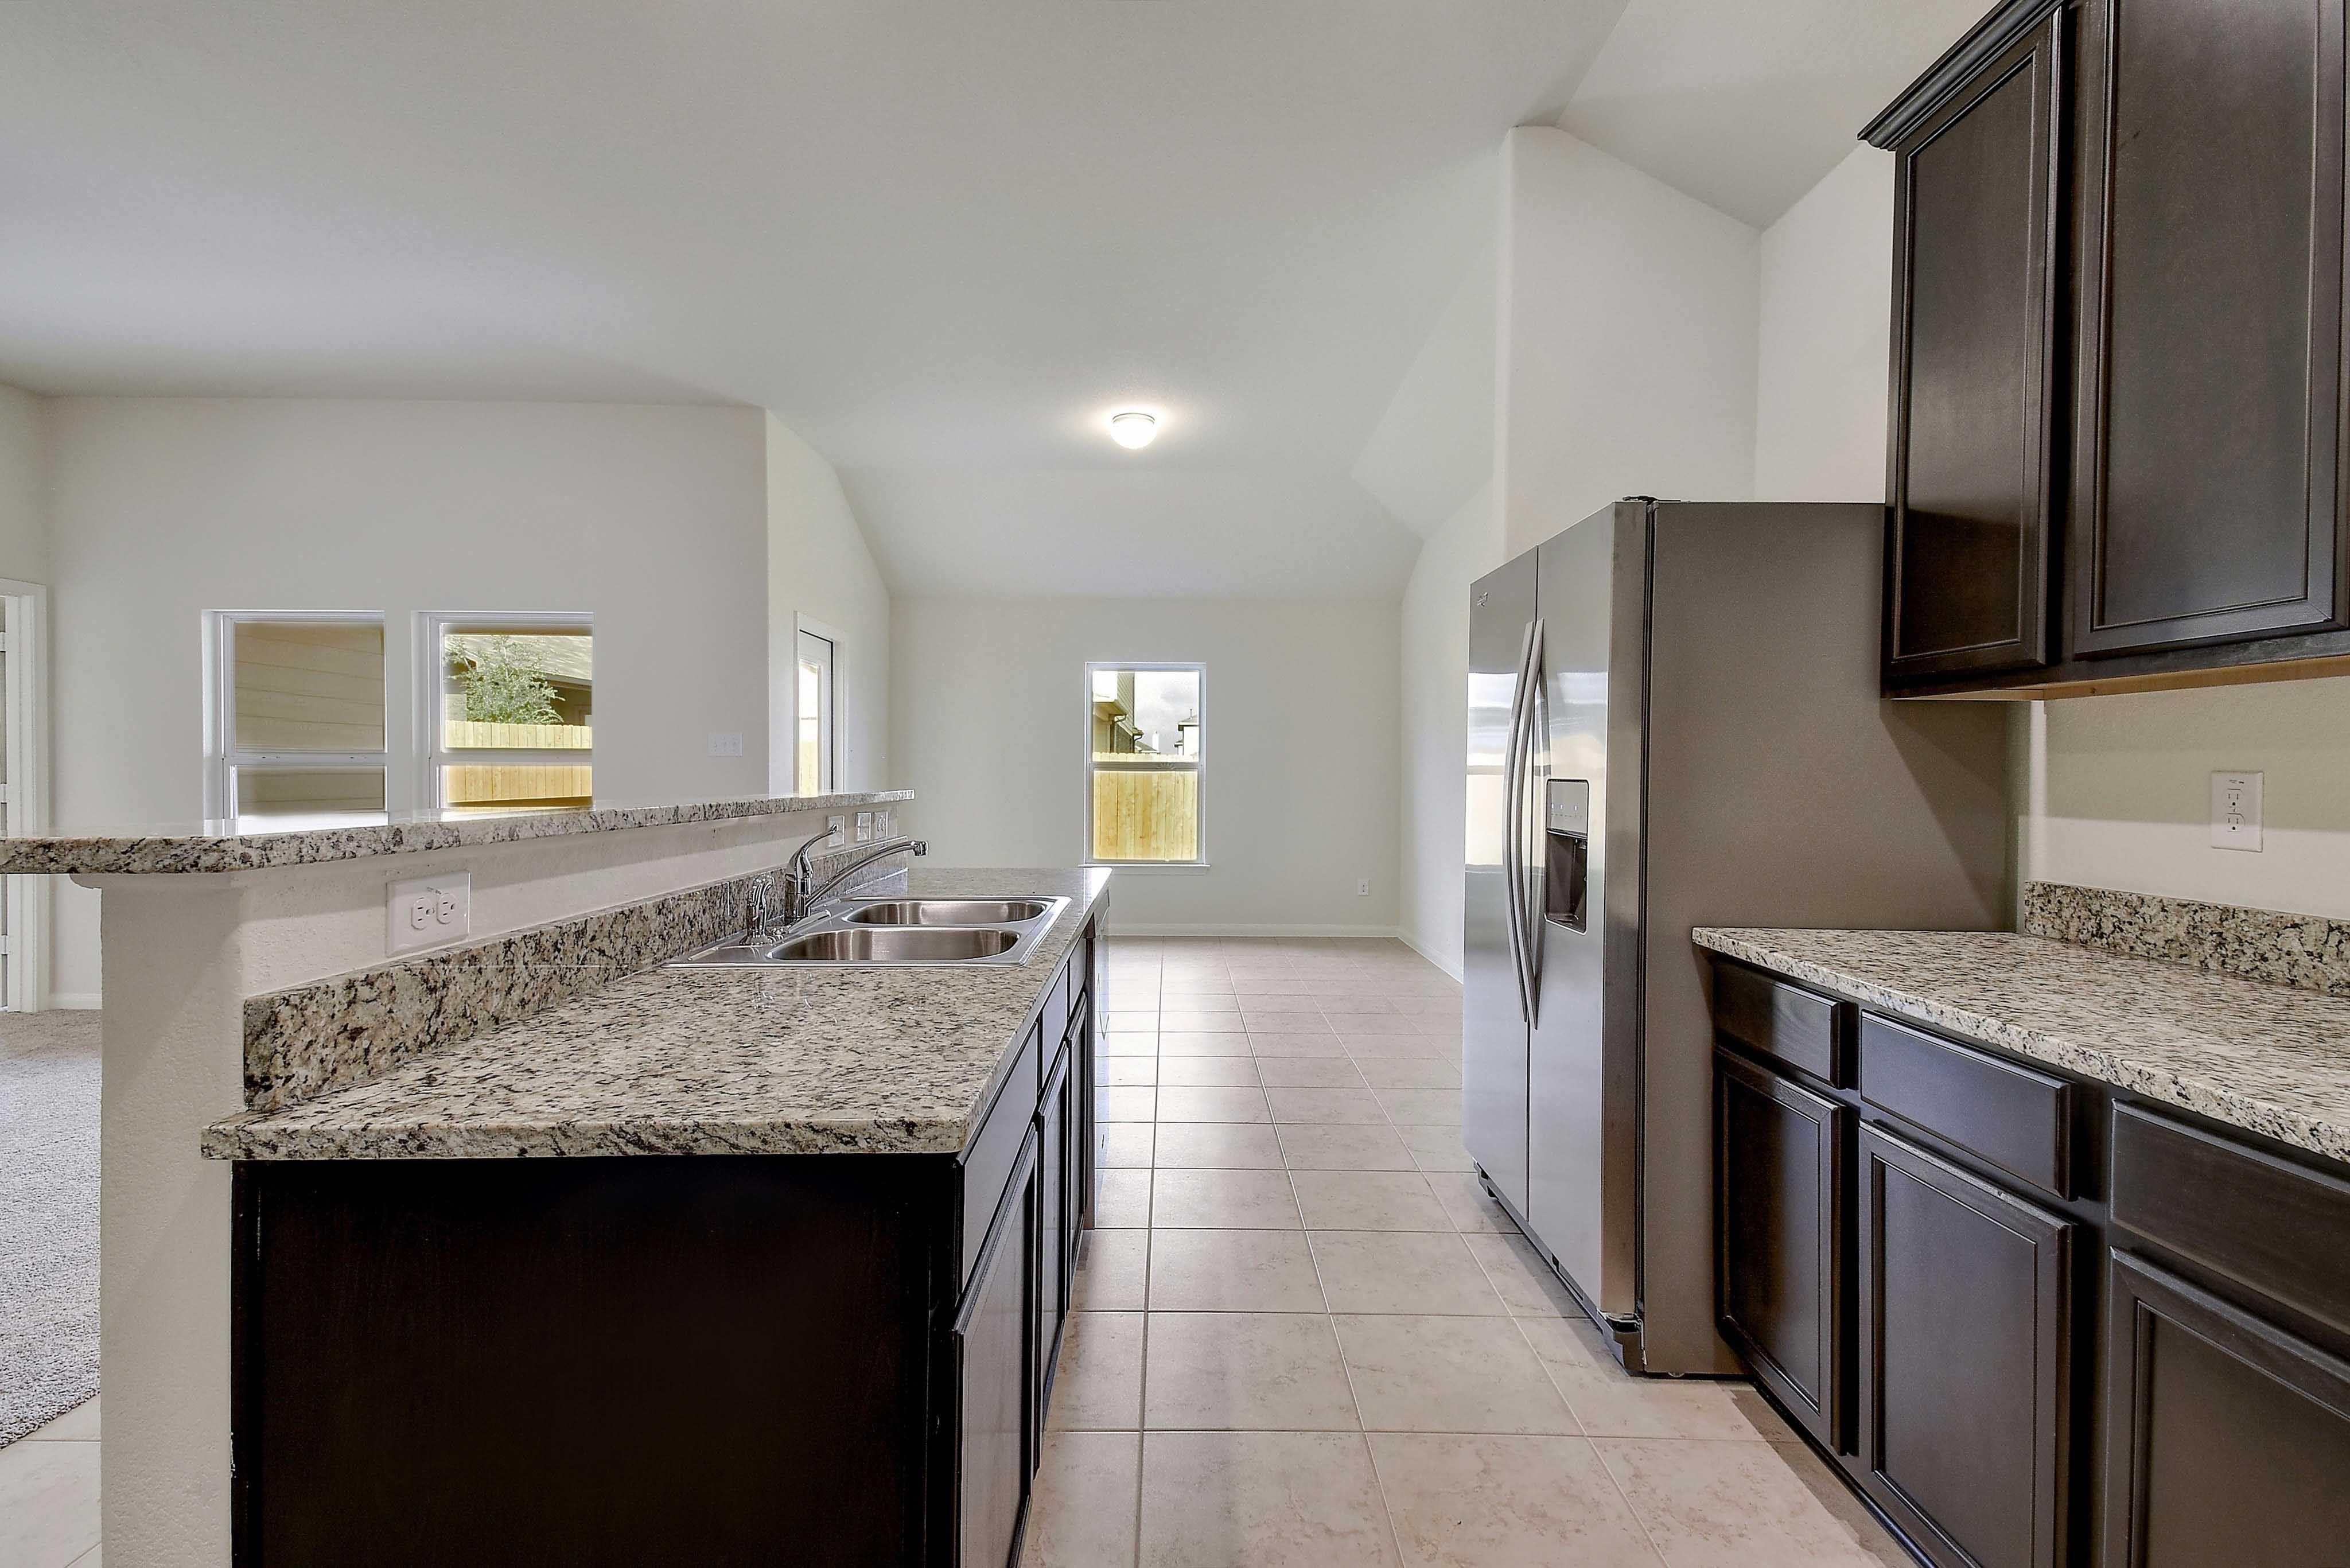 Kendall Plan, San Antonio, Texas 78254   Kendall Plan At Talise De Culebra  By LGI Homes